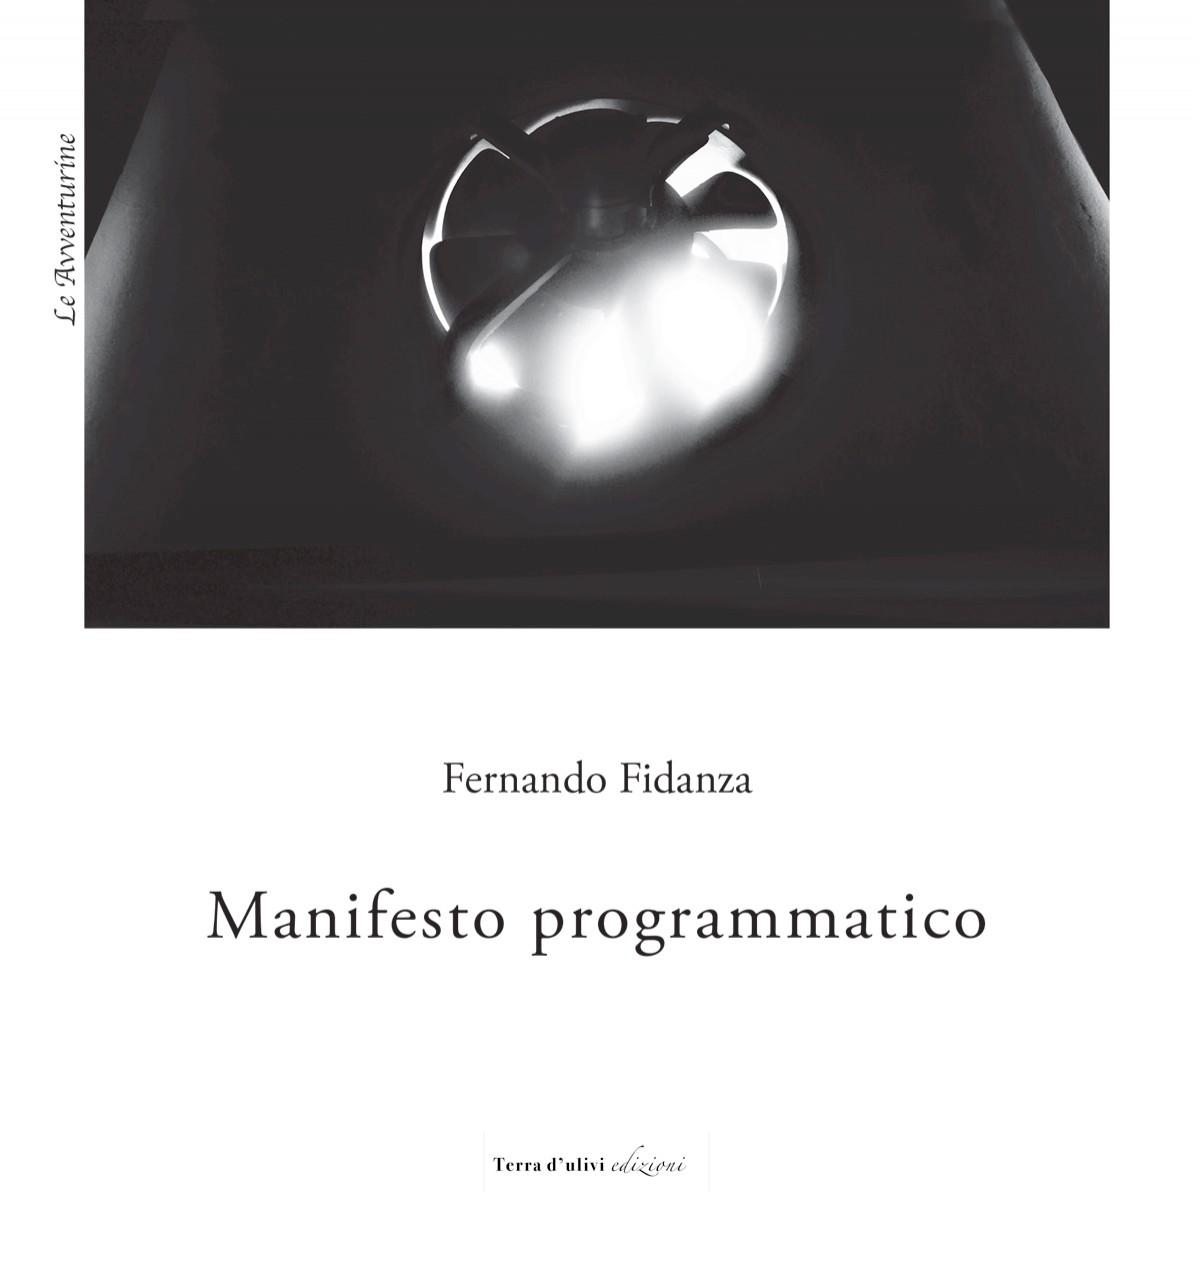 Manifesto programmatico